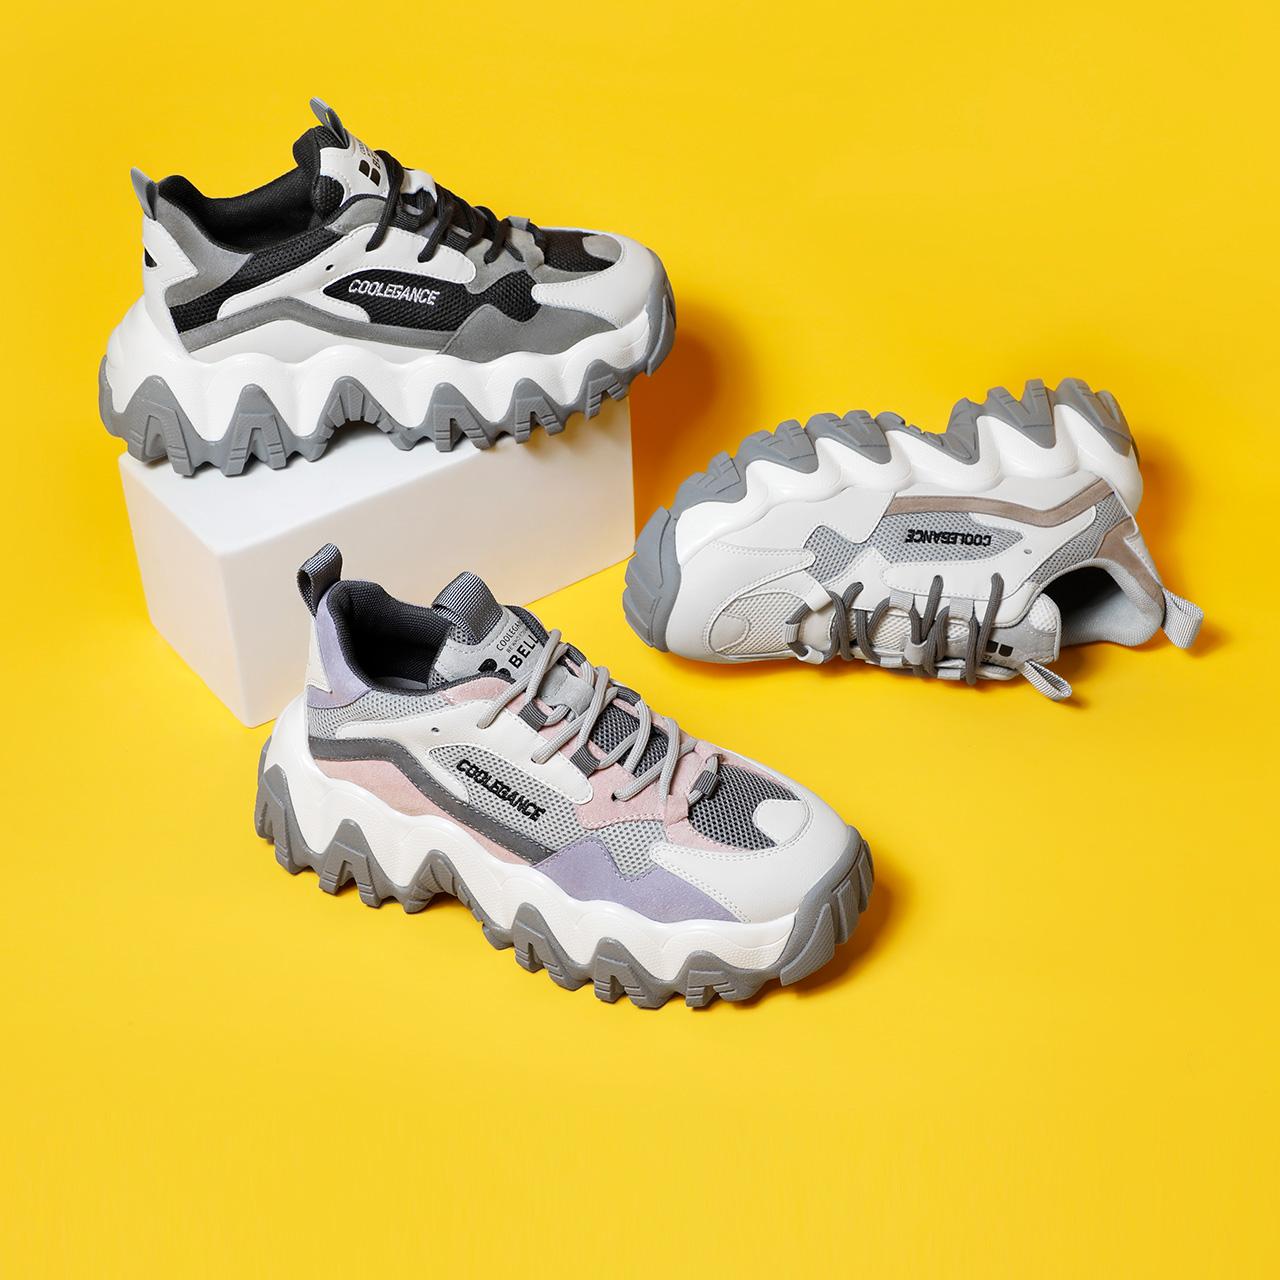 20702AM0 春季新品商场同款休闲鞋 2020 聚百丽剑齿小虎牙老爹鞋女